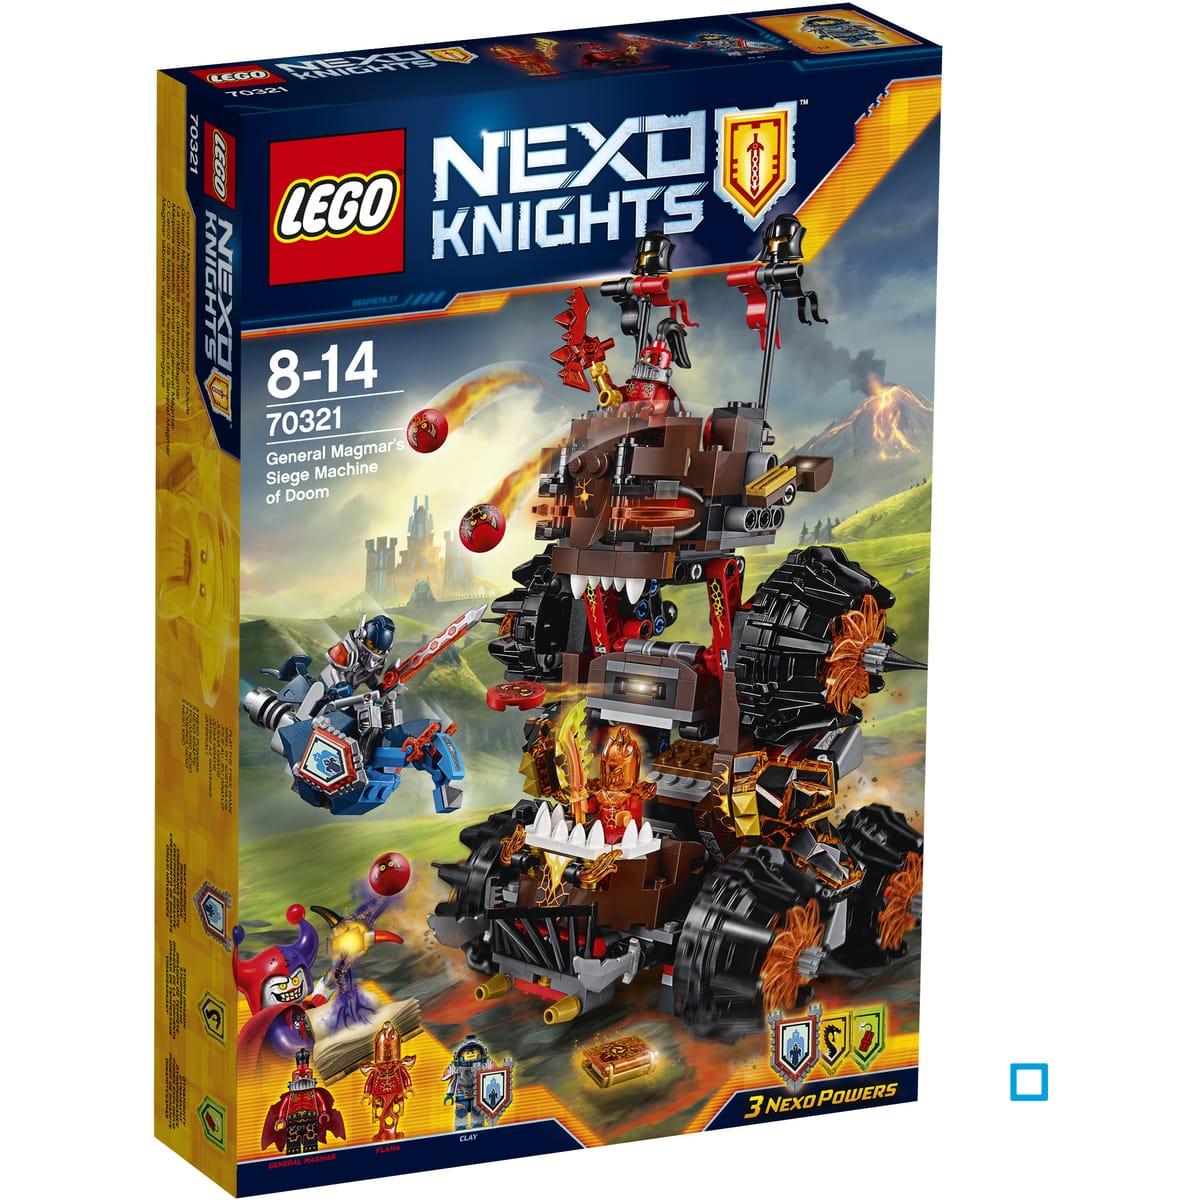 Jouet Lego Nexo Knights - La machine maudite du Général Magmar (70321)